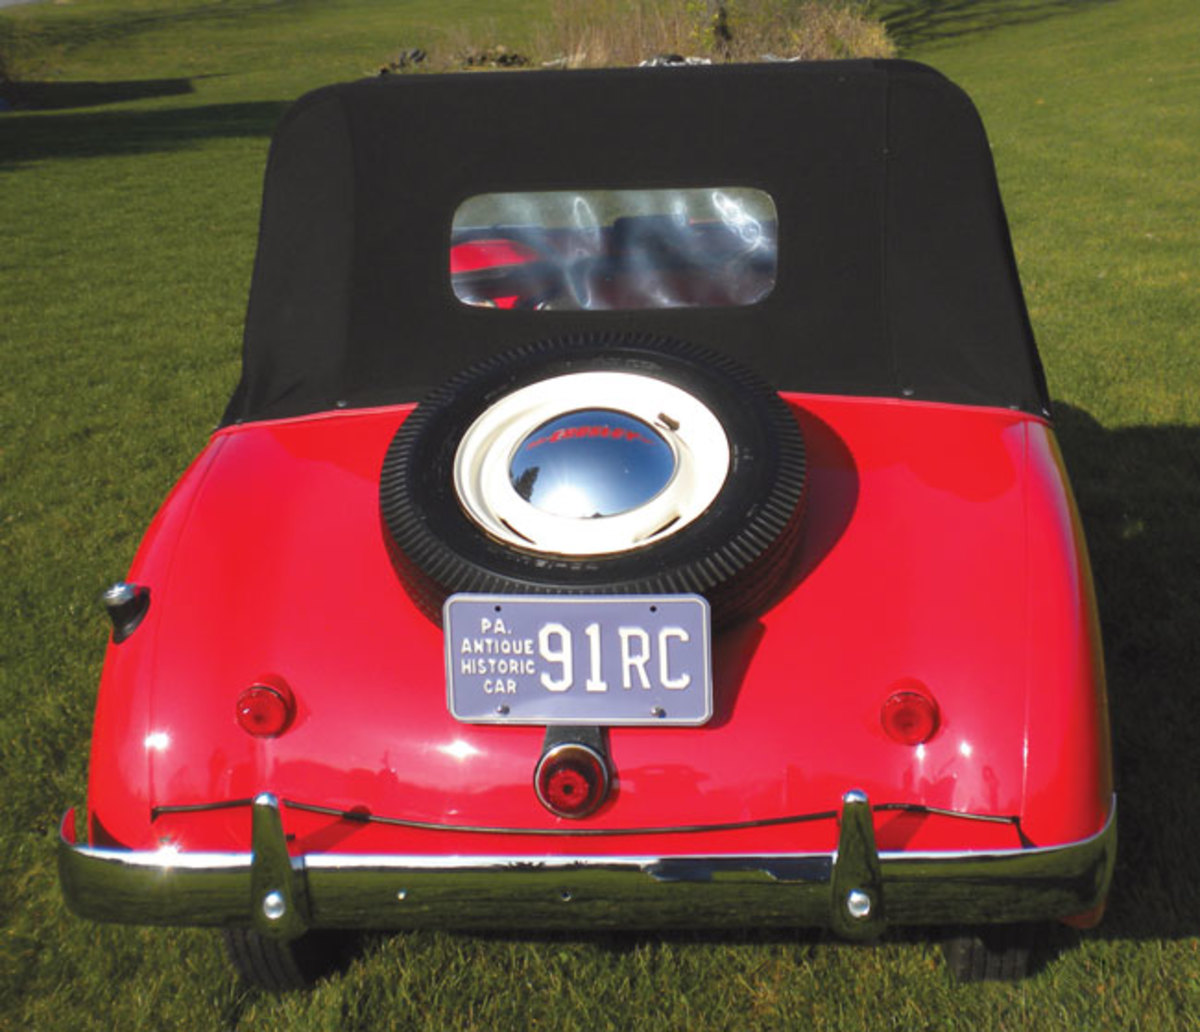 1951-Crosley-Hot-Shot-rear